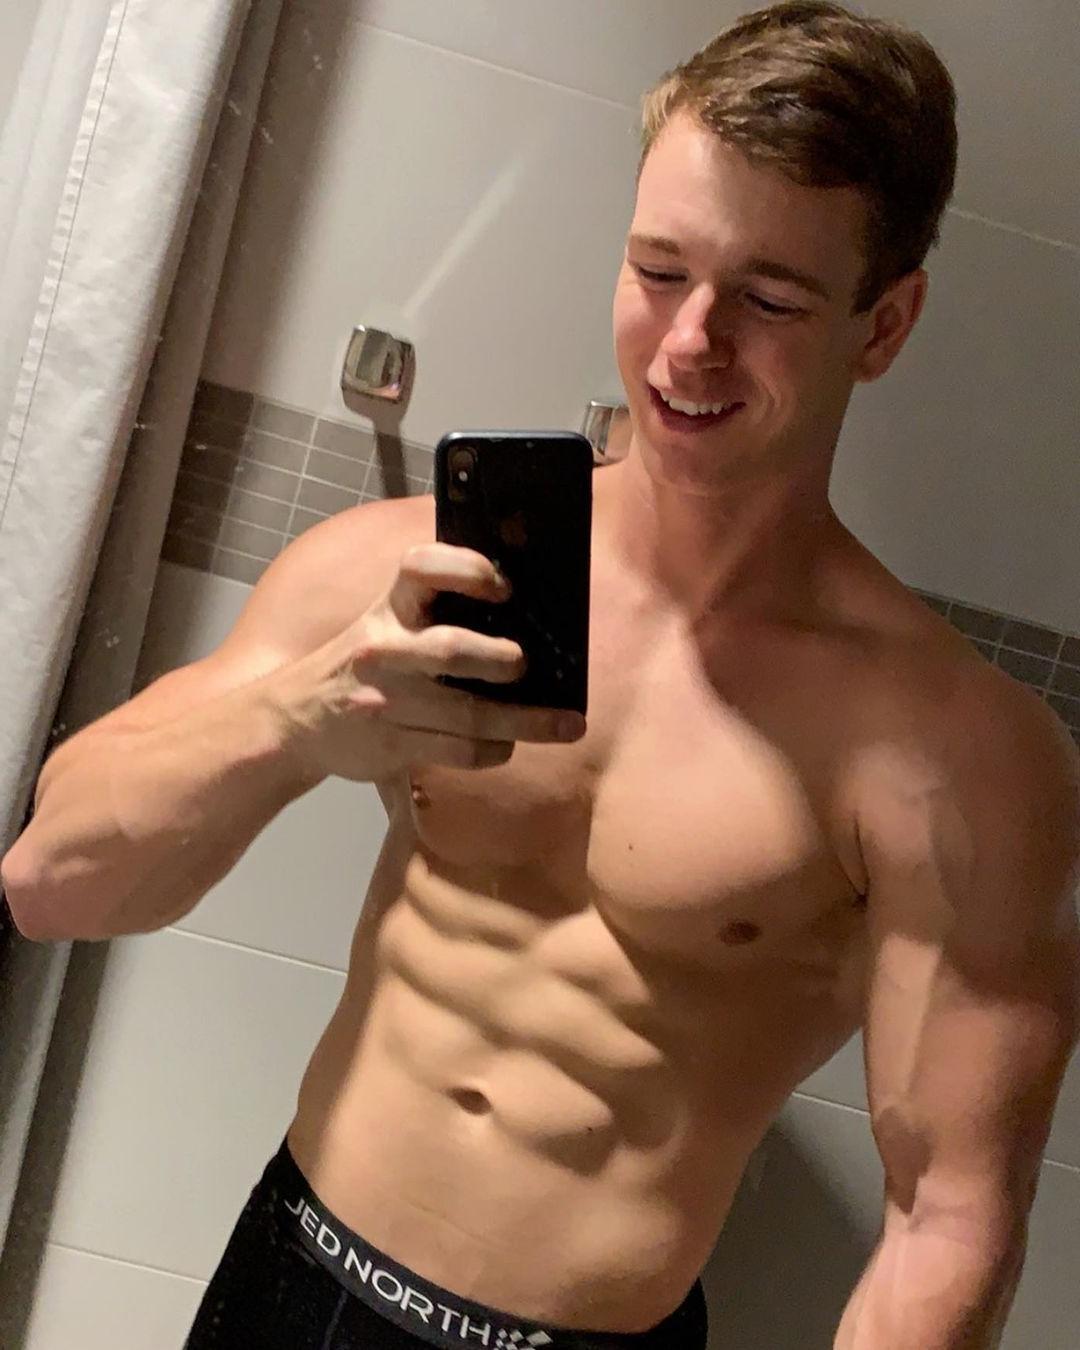 cute-shirtless-muscular-guys-ben-petersen-smiling-selfie-abs